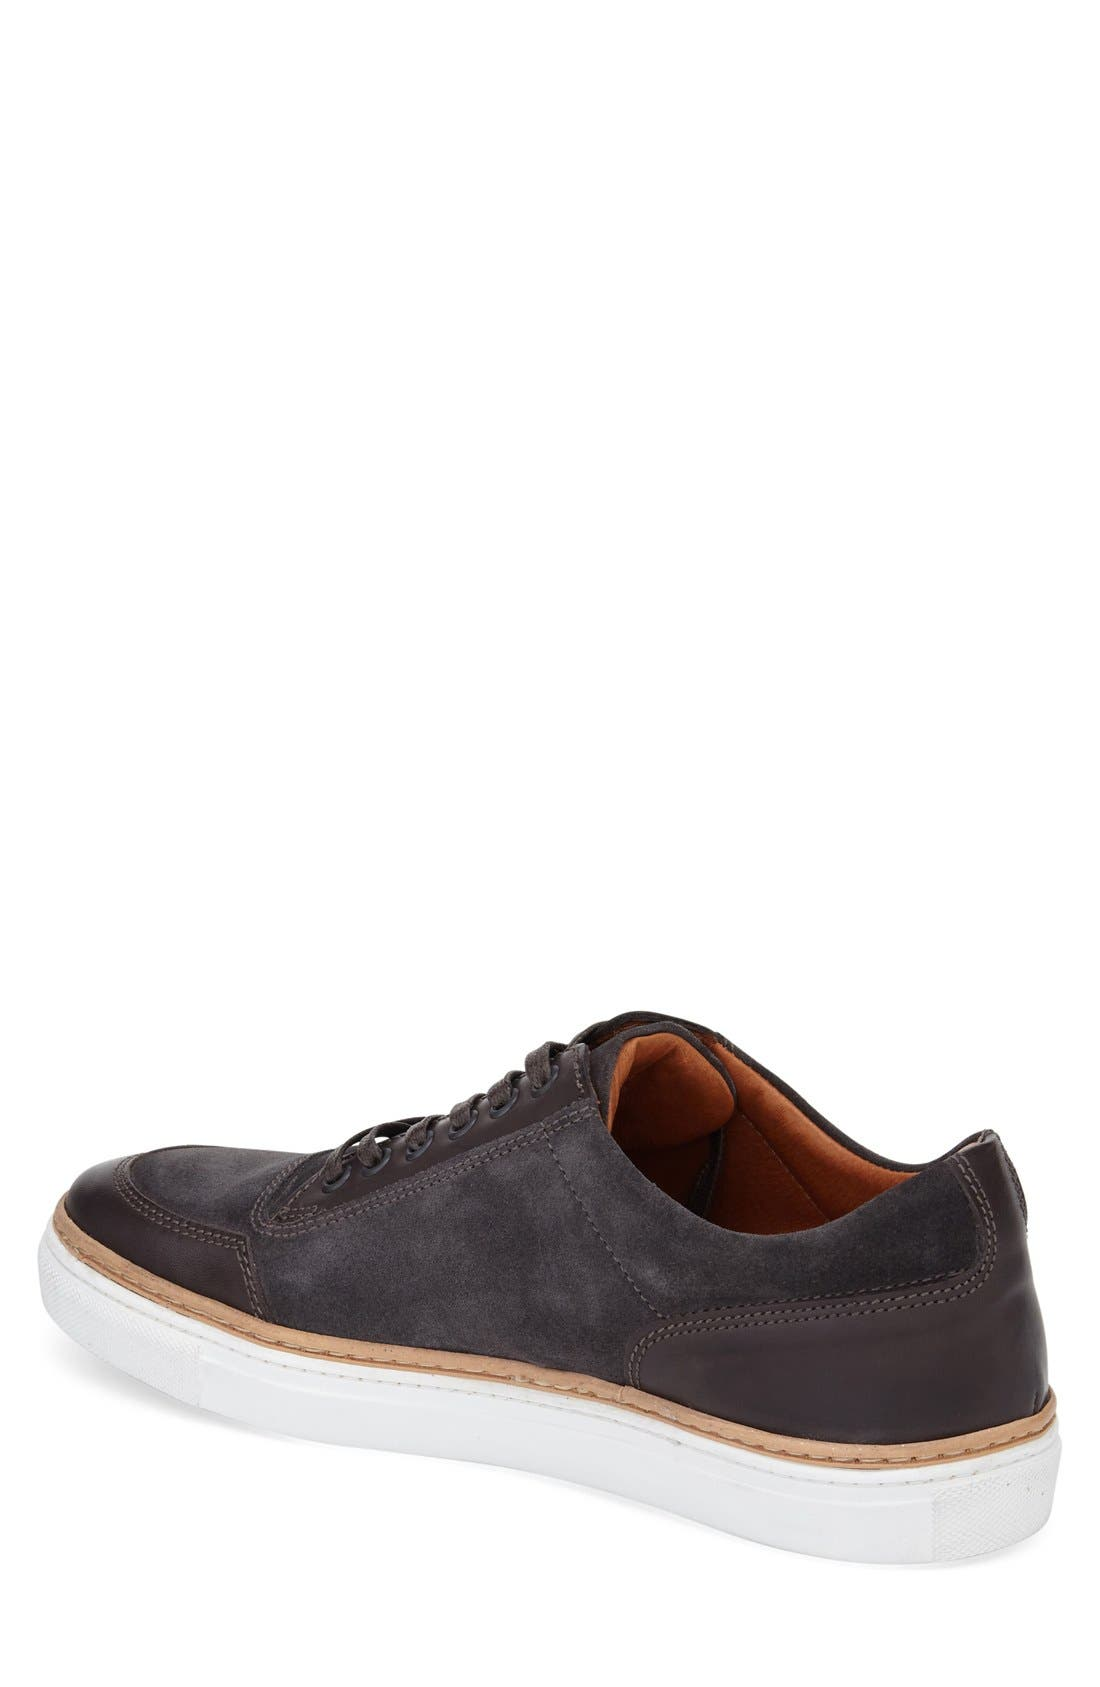 Prem-Ium Sneaker,                             Alternate thumbnail 2, color,                             020